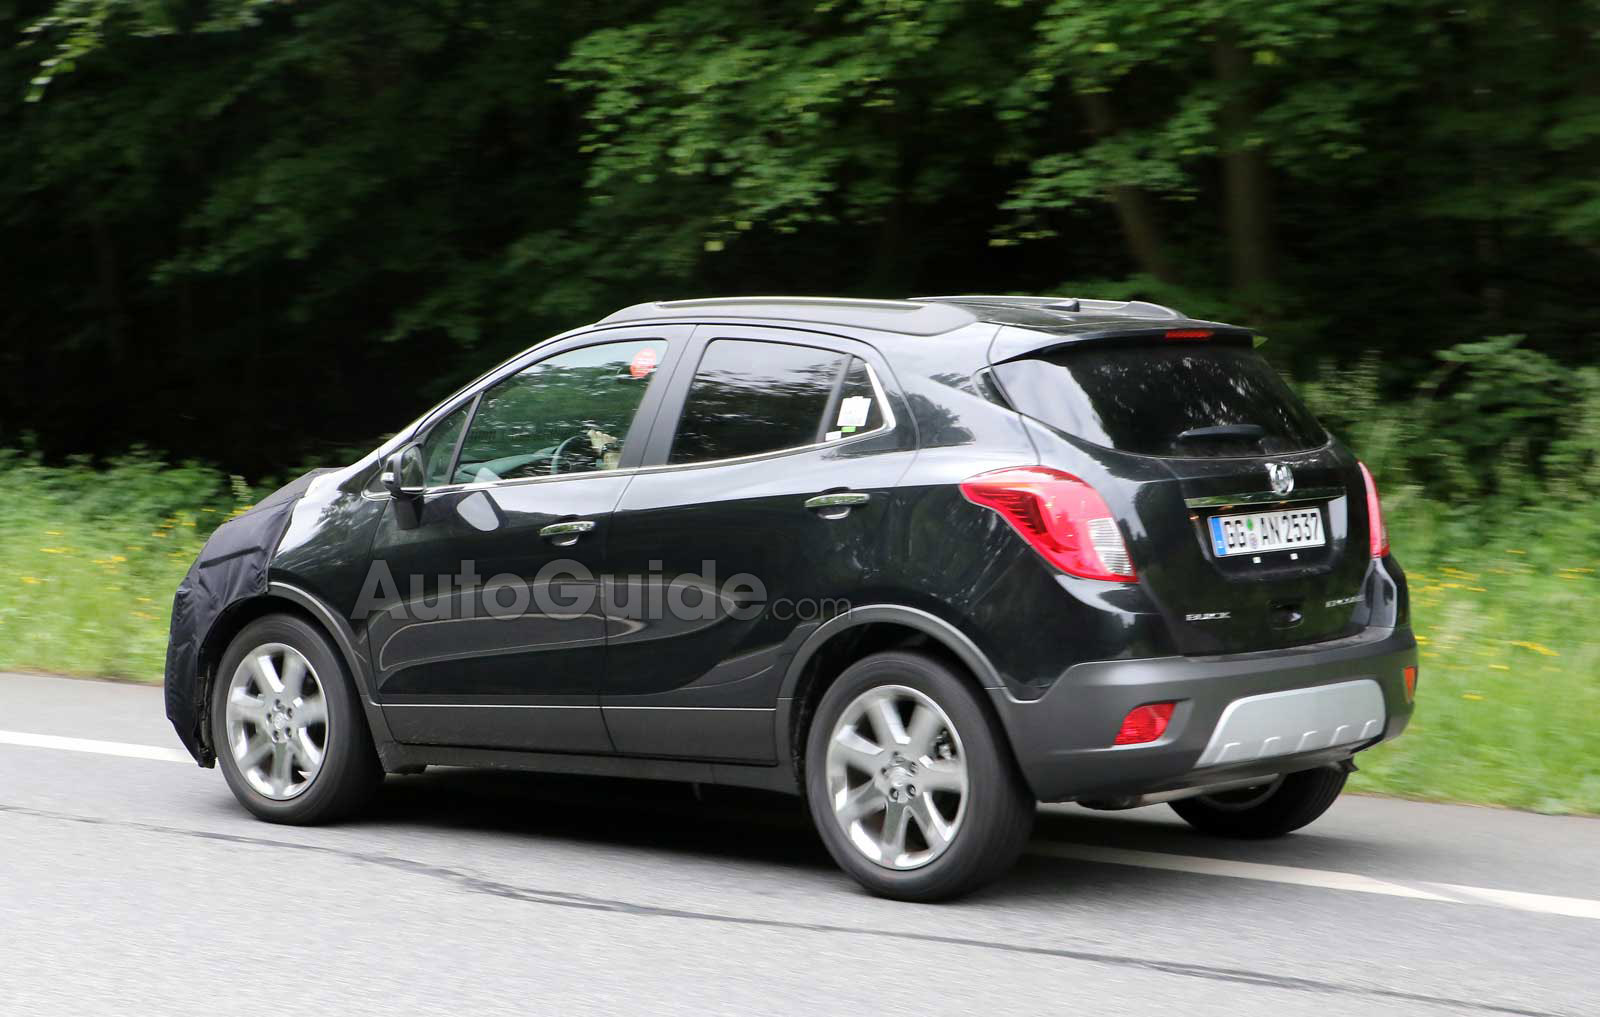 2016 Buick Encore Spy Photos - Chevy Trax Forum